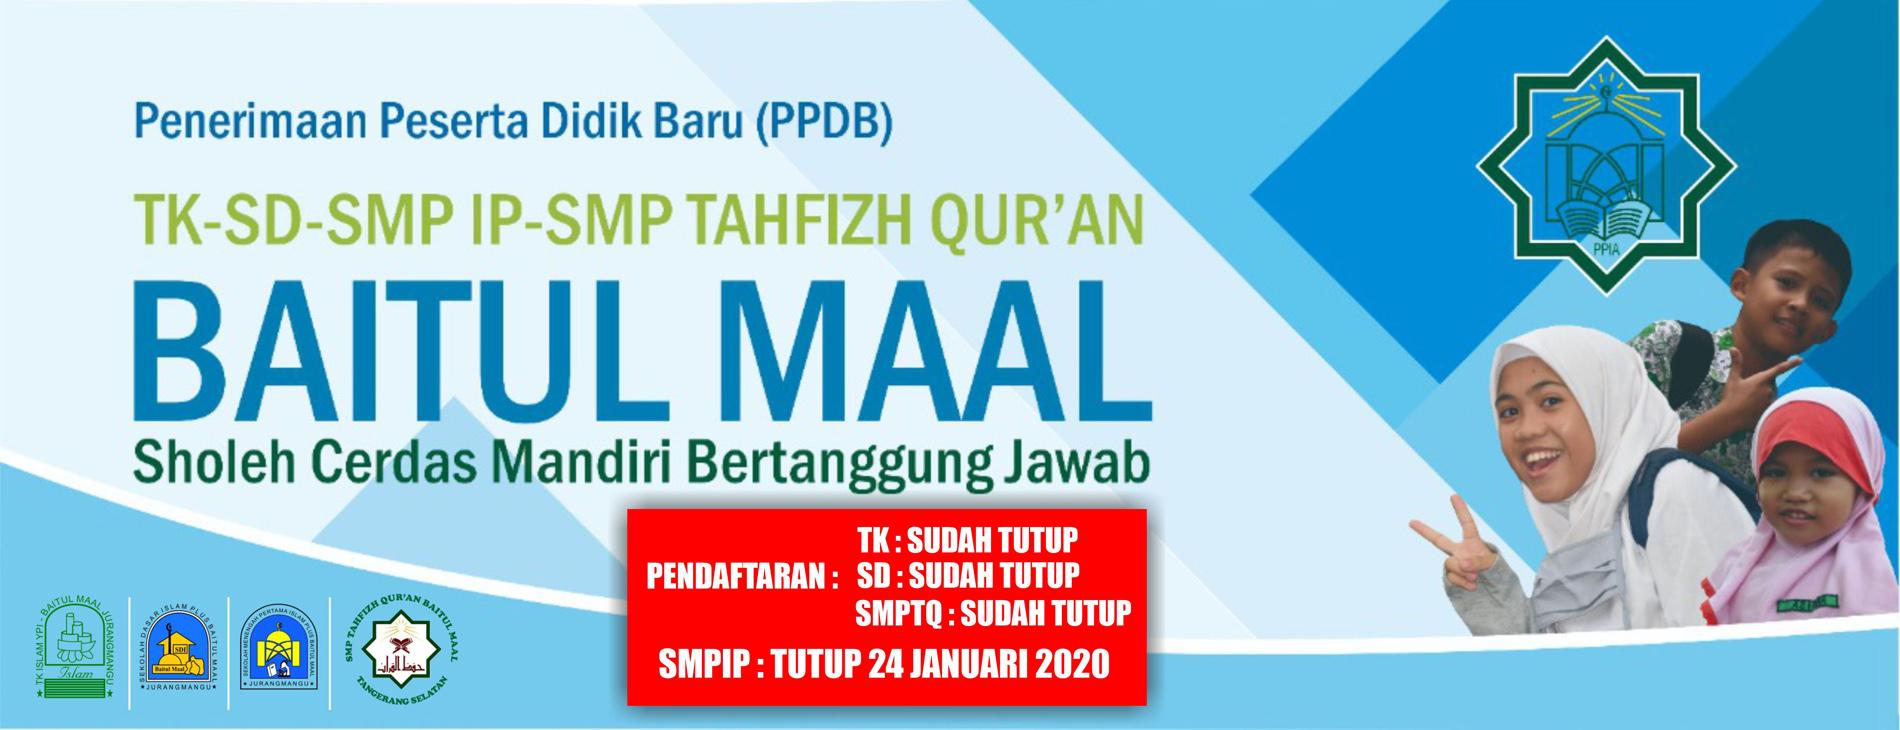 ppdb_2020_6.jpg